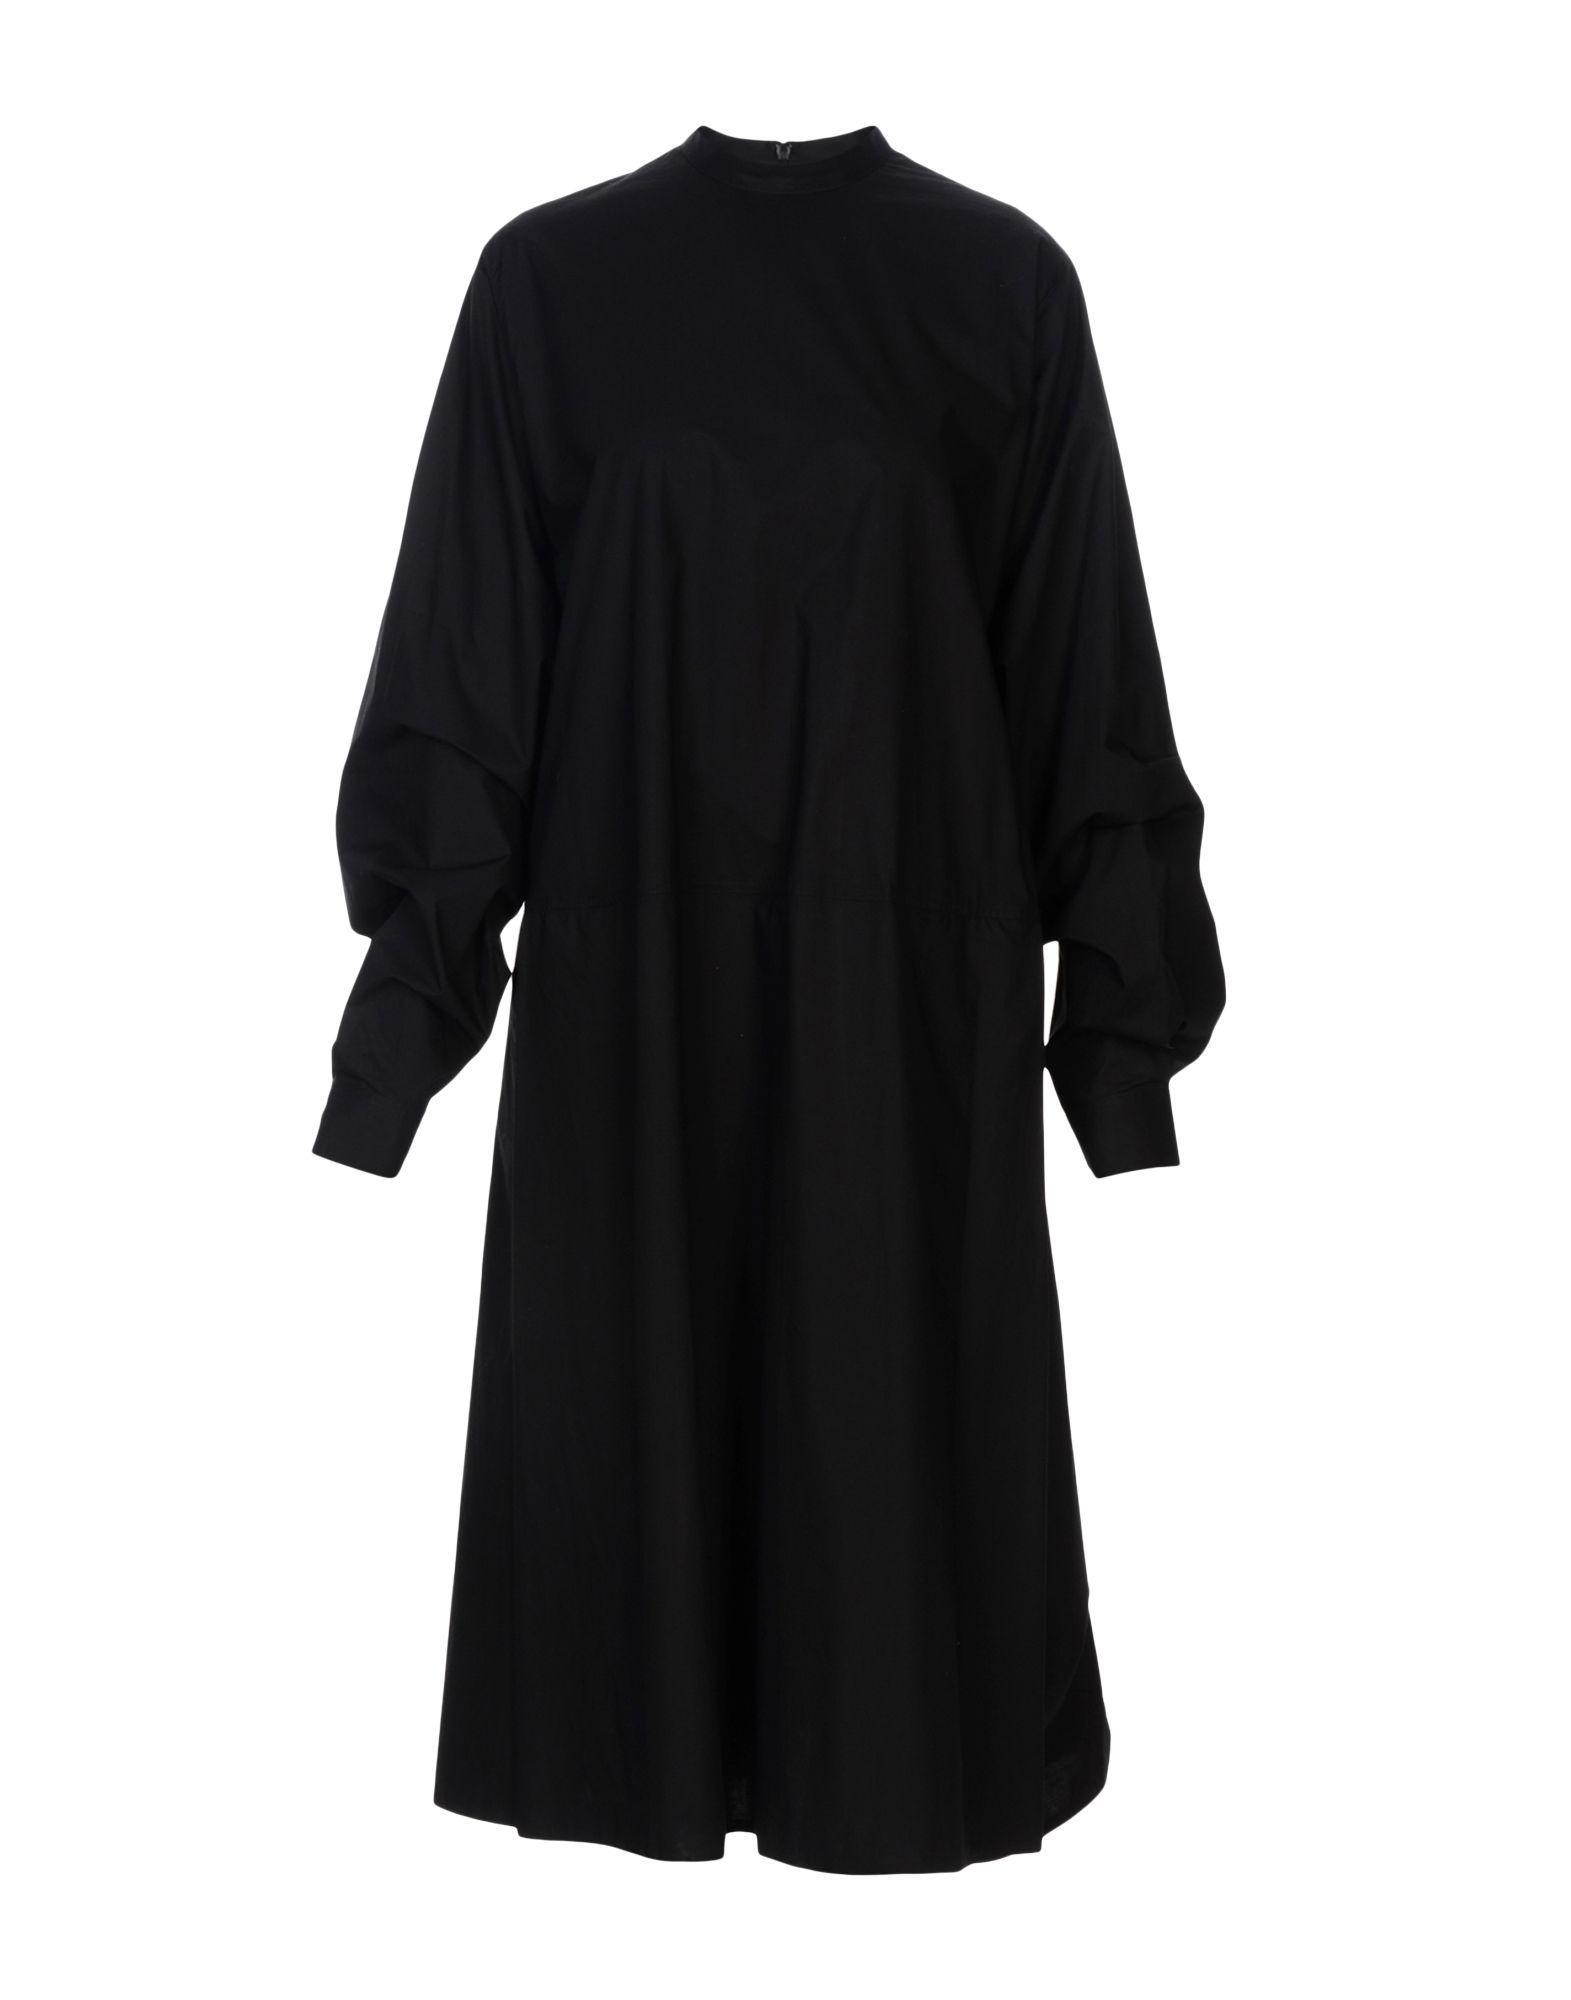 Mm6 Maison Margiela Midi Dress In Black